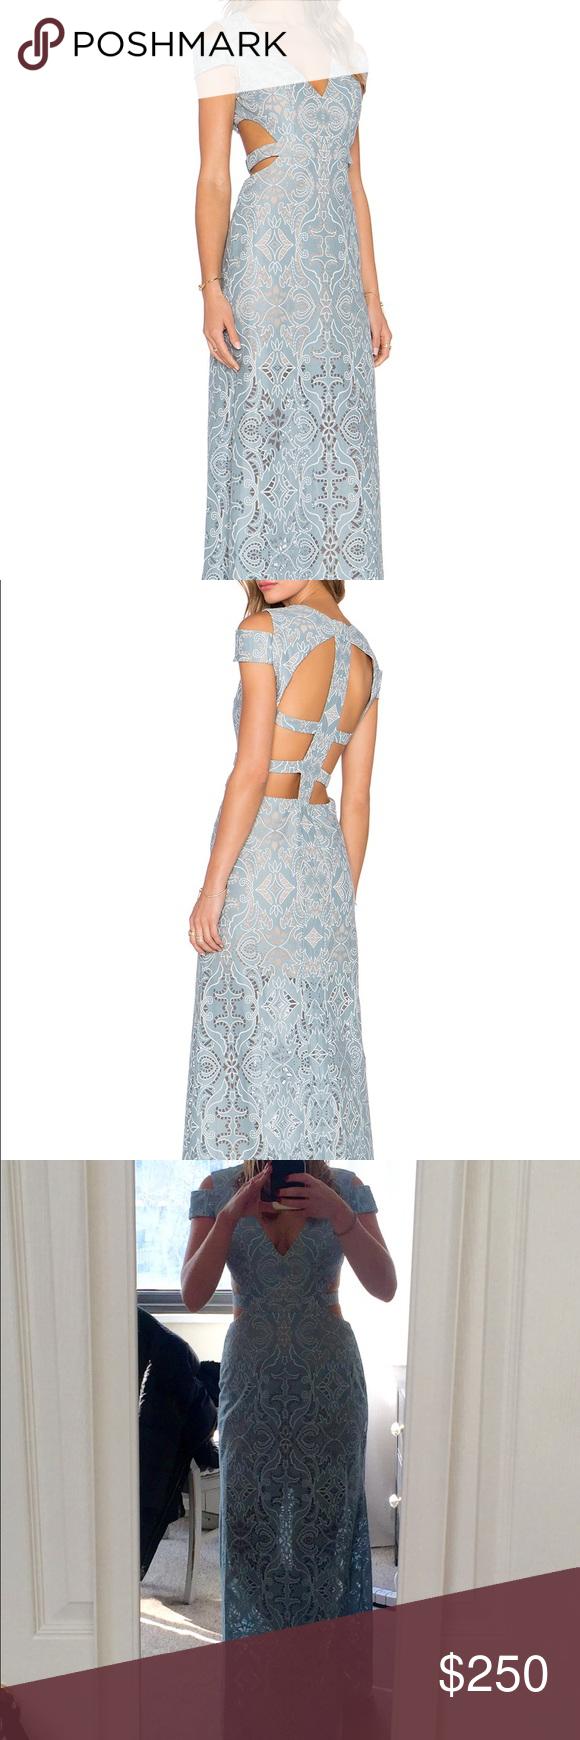 BCBGmaxazria Ava cutout gown size 2 | Ava, Bcbgmaxazria dresses and ...